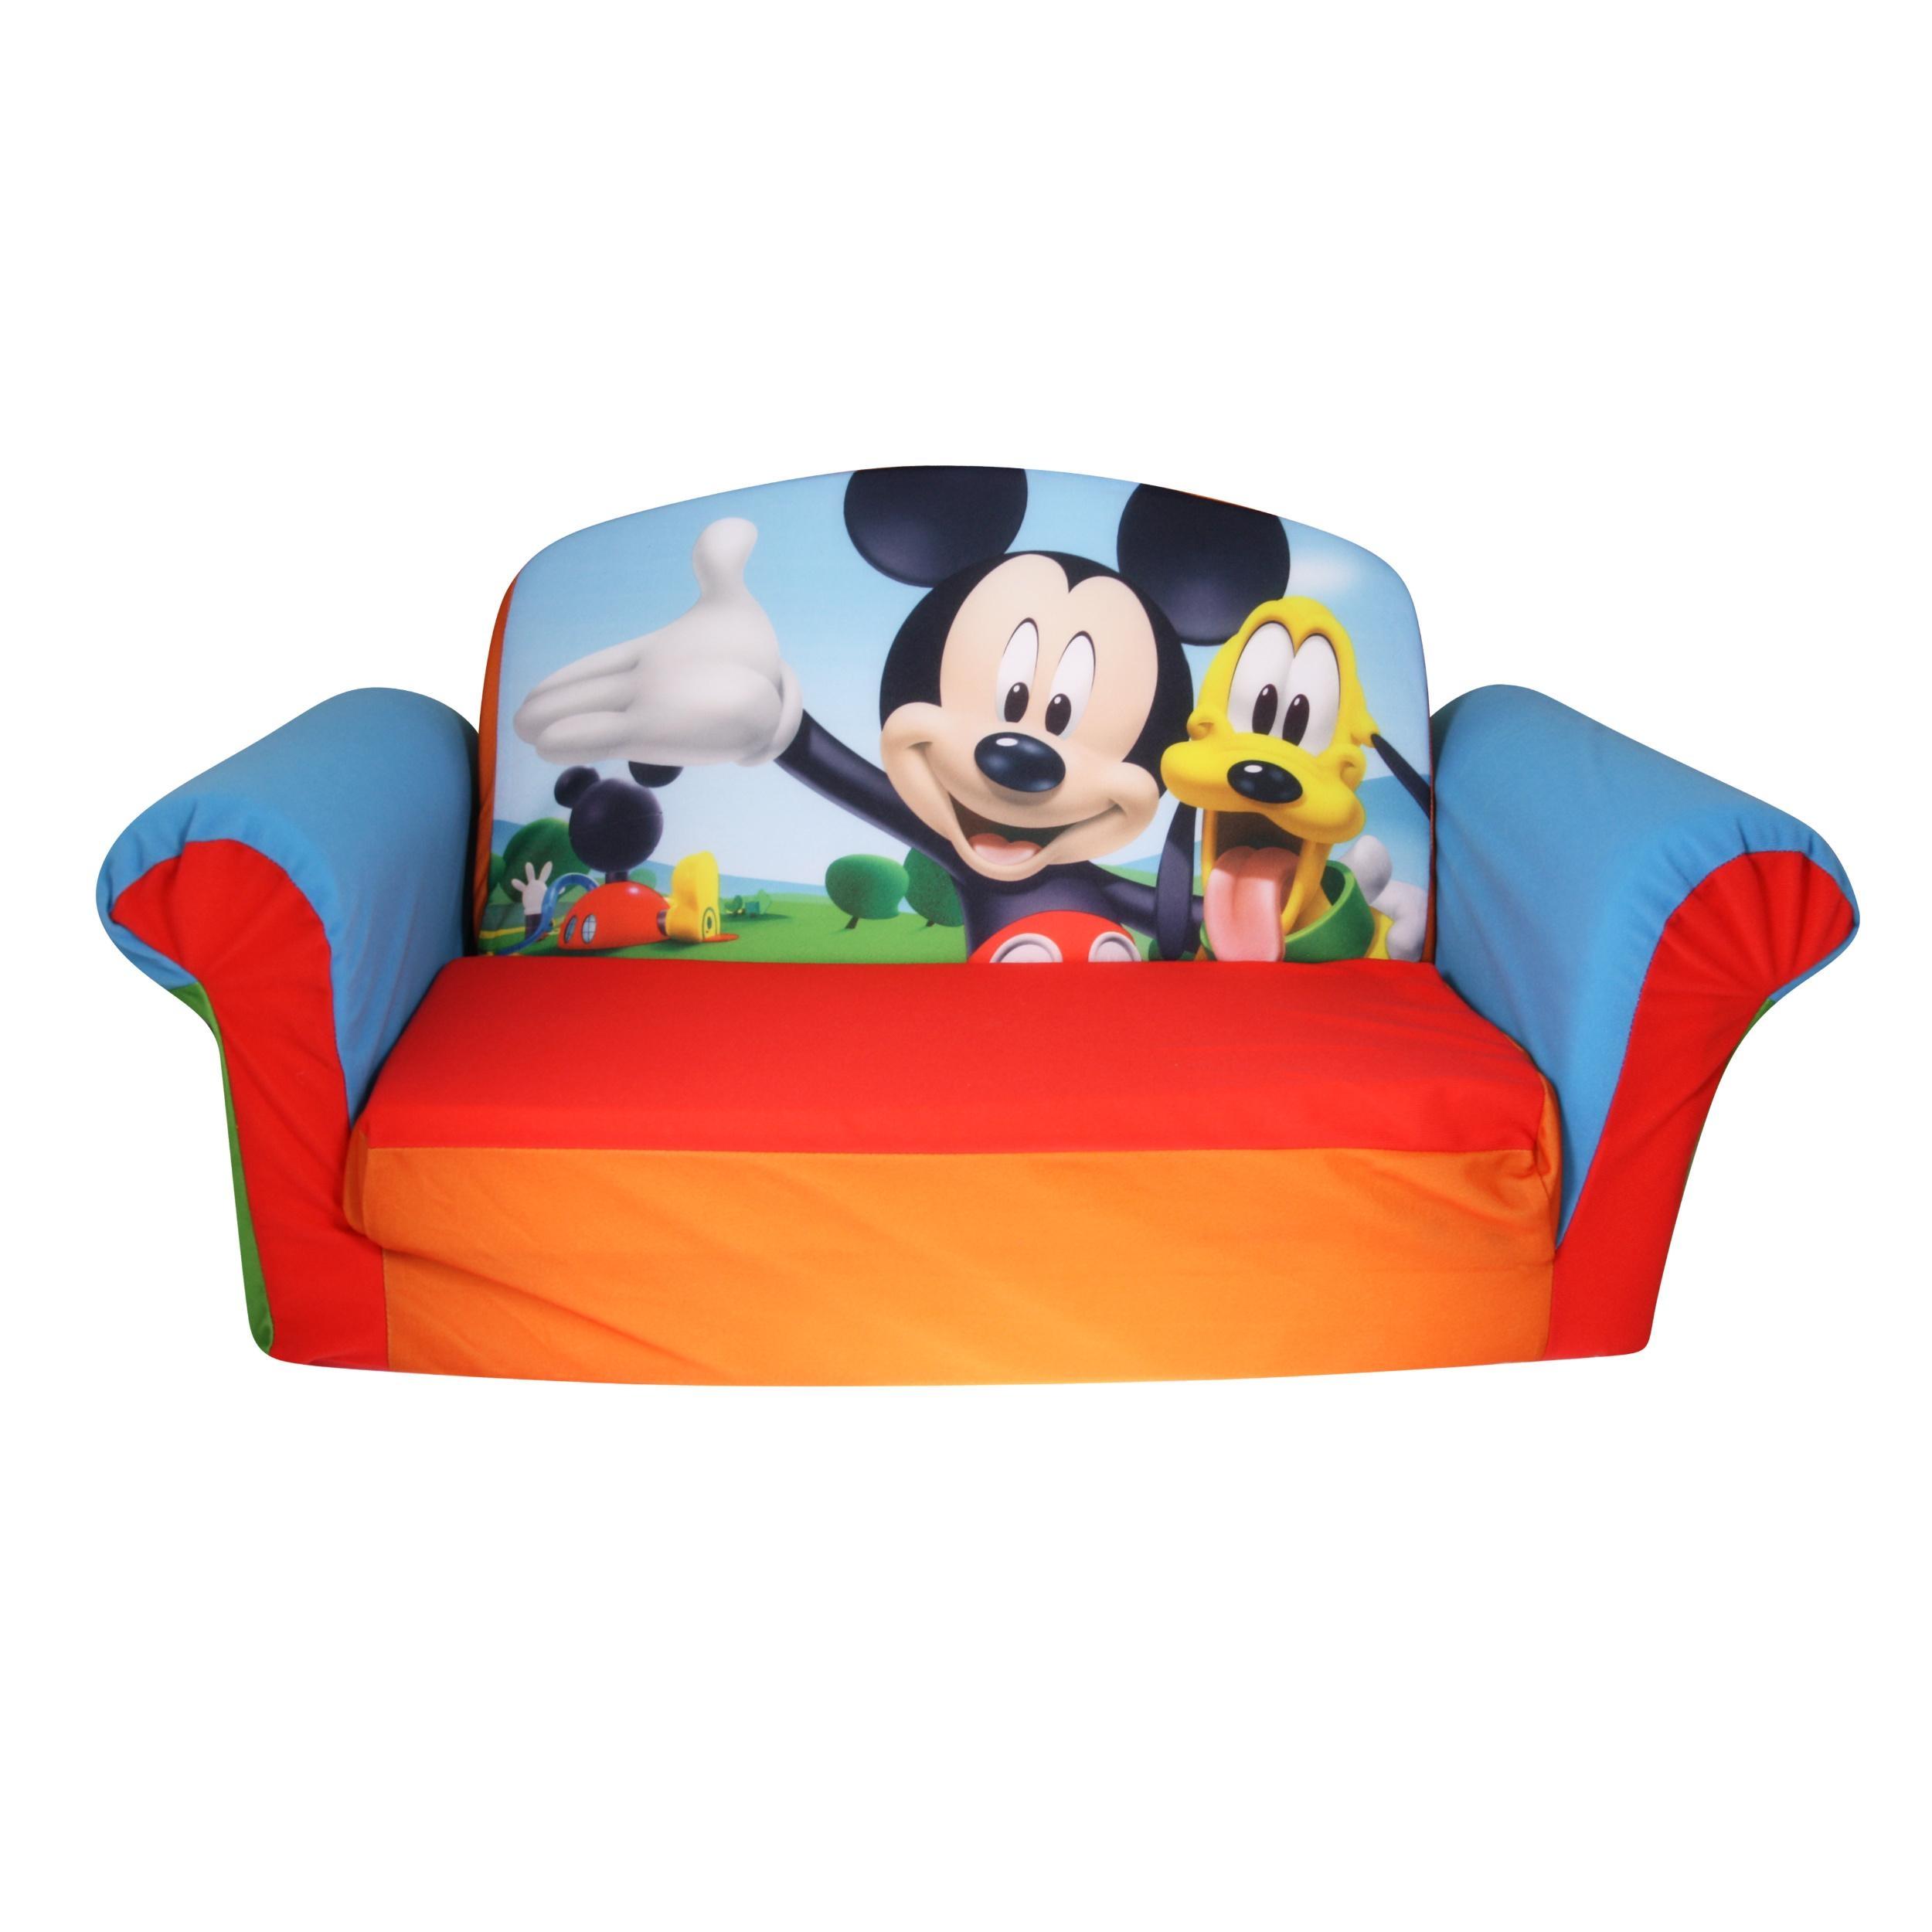 Marshmallow Furniture, Children's 2 In 1 Flip Open Foam Sofa Regarding Kid Flip Open Sofa Beds (View 15 of 20)